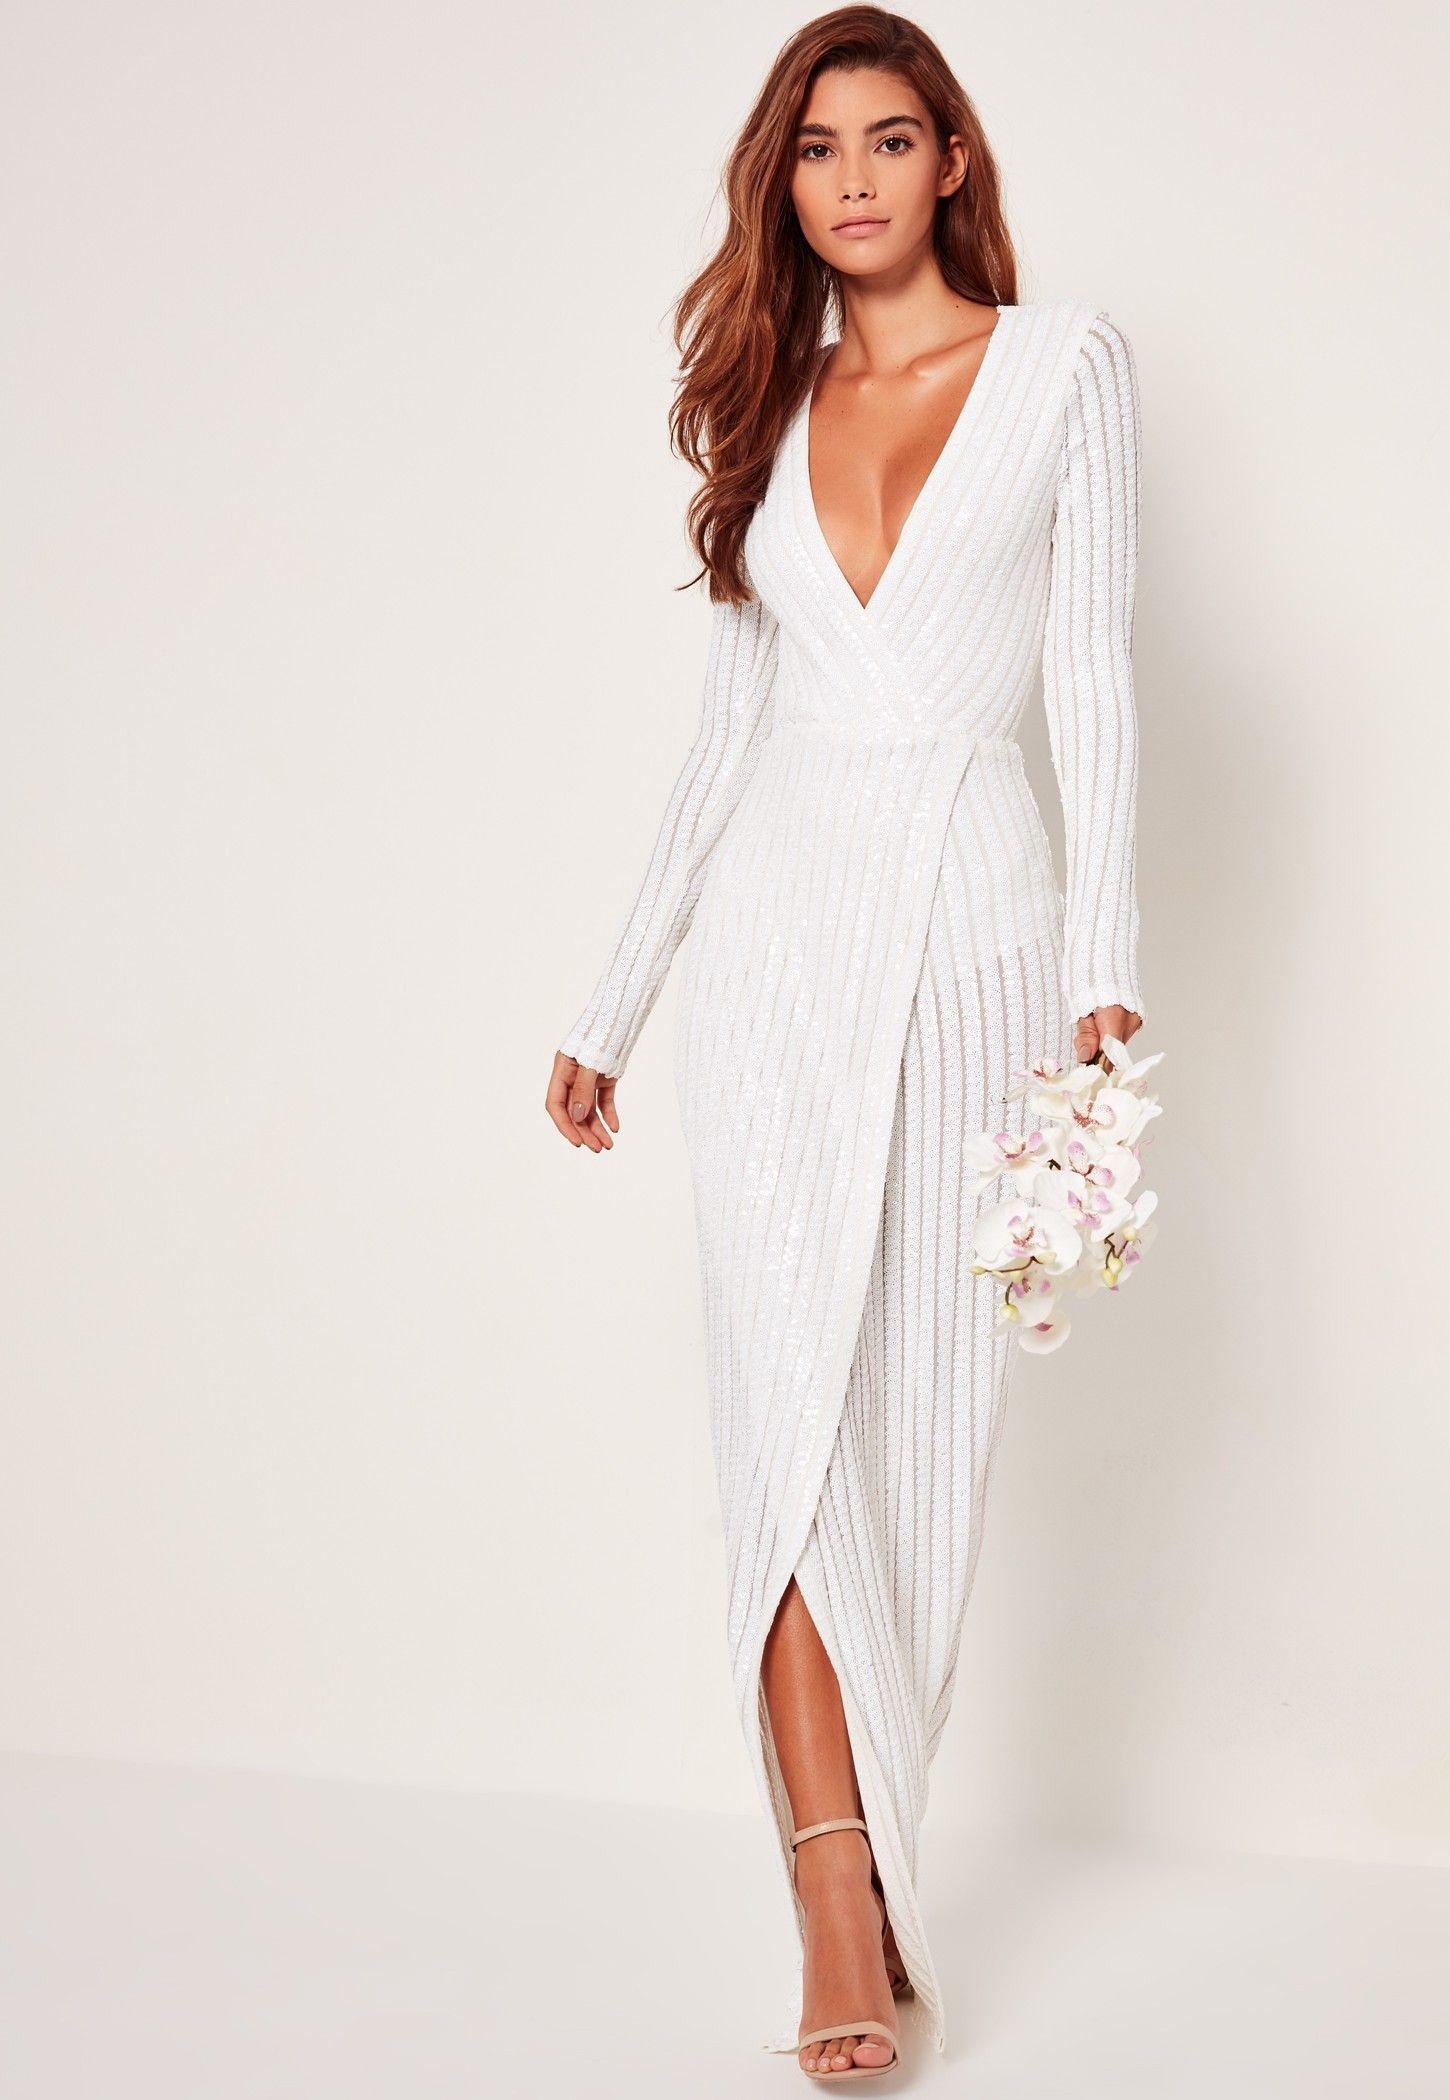 Bridal Sequin Stripe Wrap Maxi Dress White | Dresses | Pinterest ...